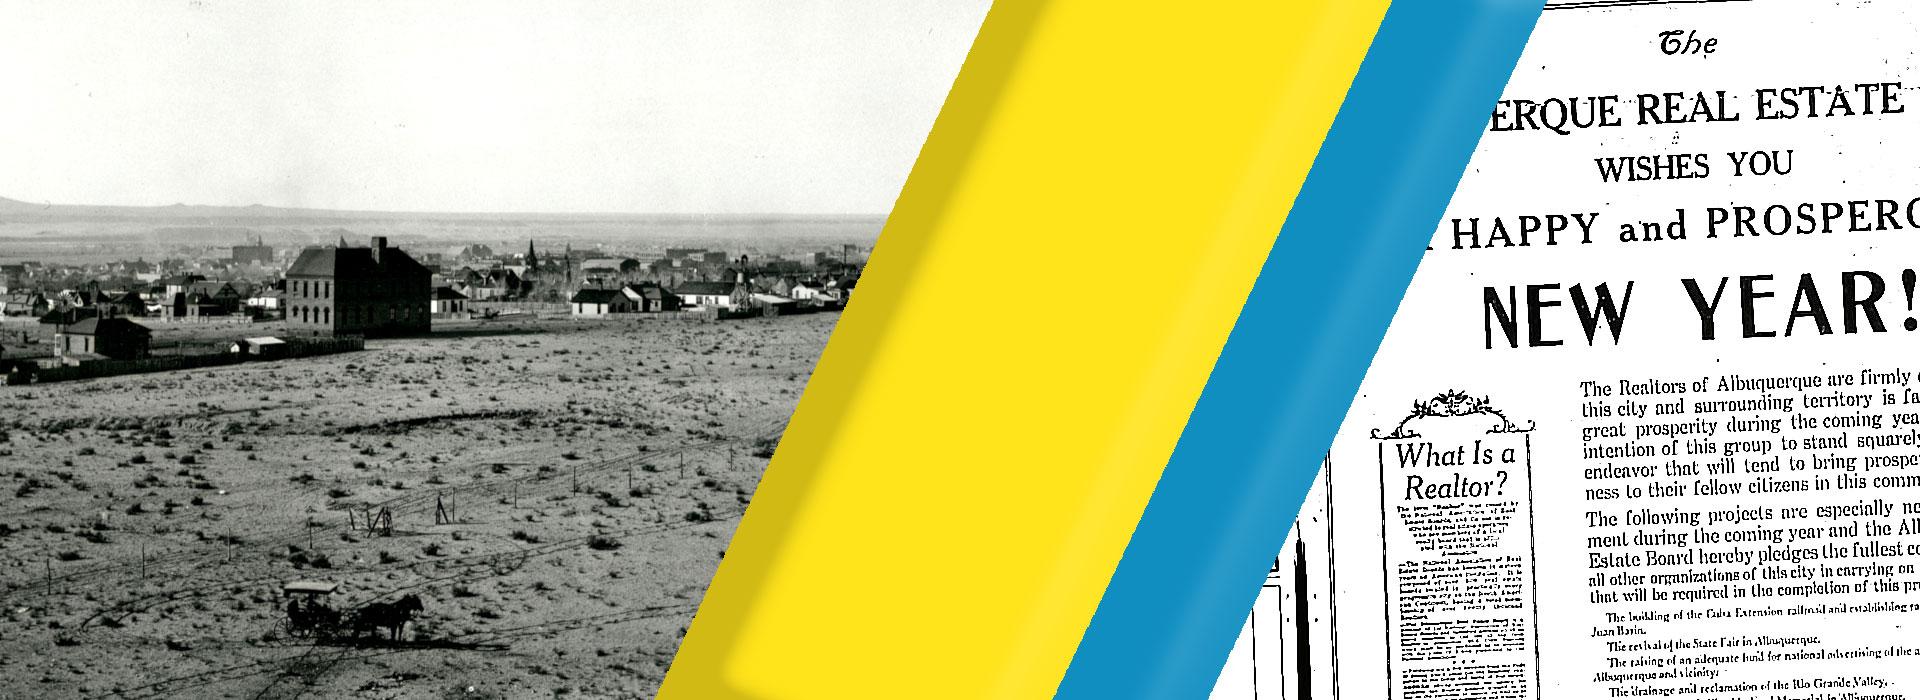 VIDEO: Building a Community: Albuquerque 1880-1920